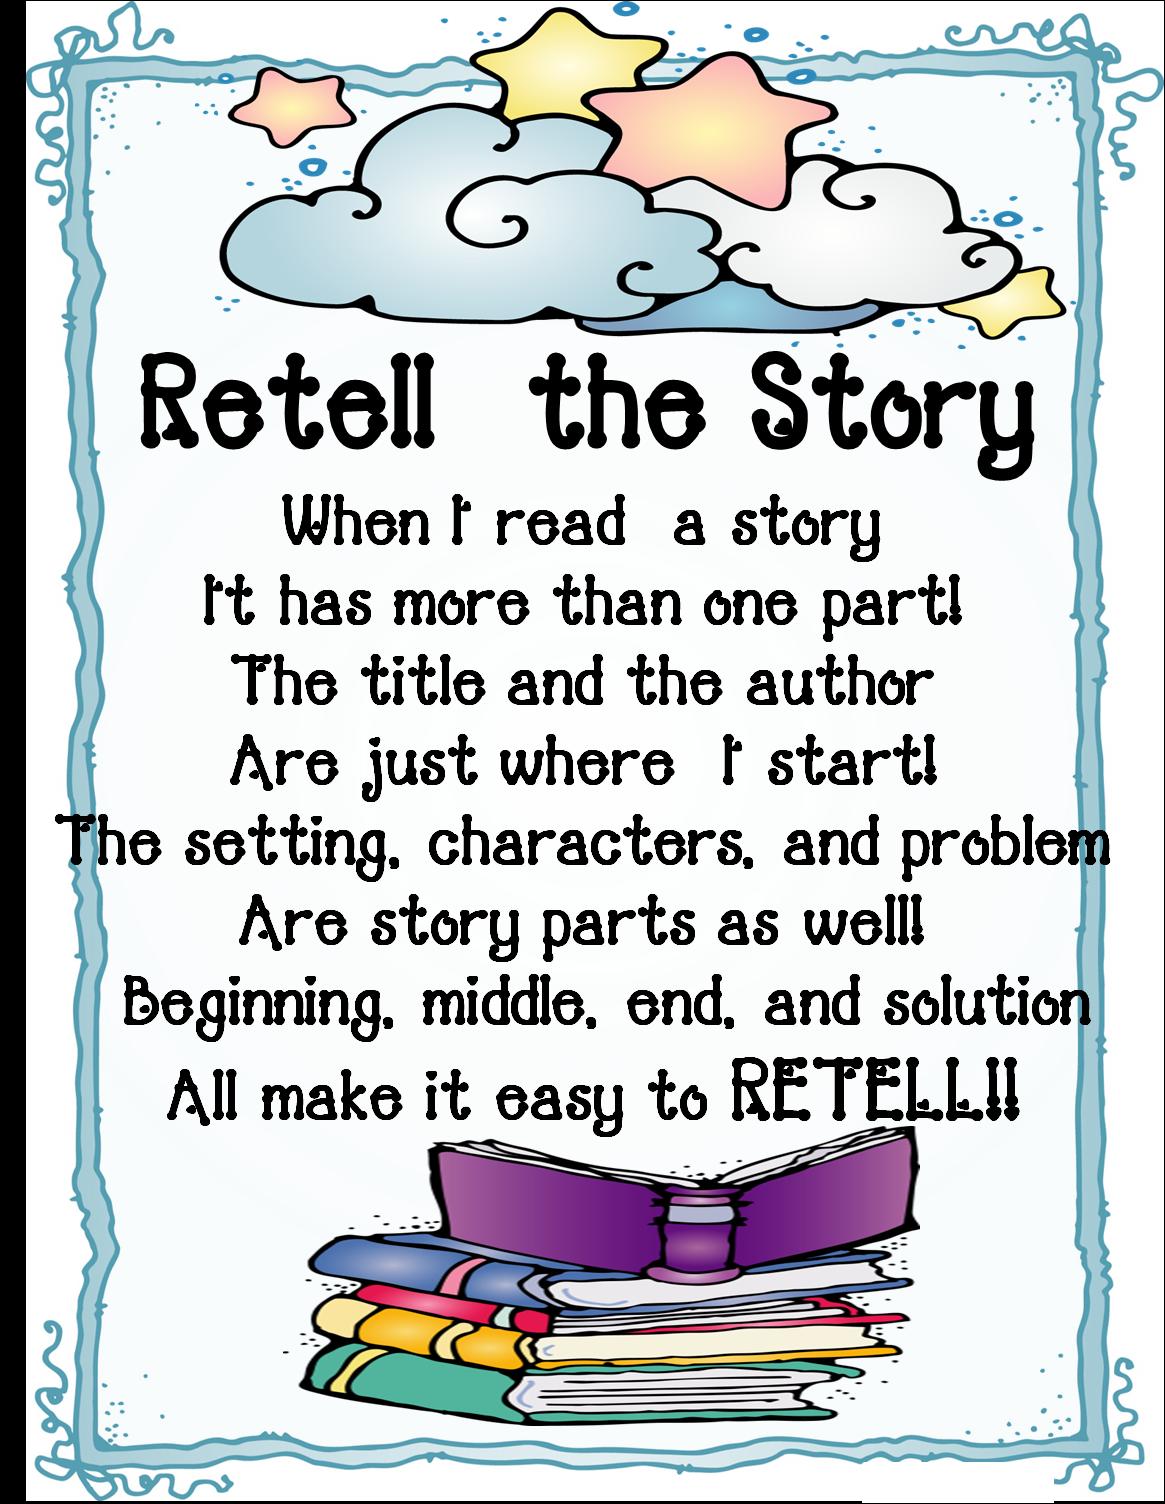 Worksheet Short Stories For First Grade short stories for first grade kathleenmoorehead an error occurred